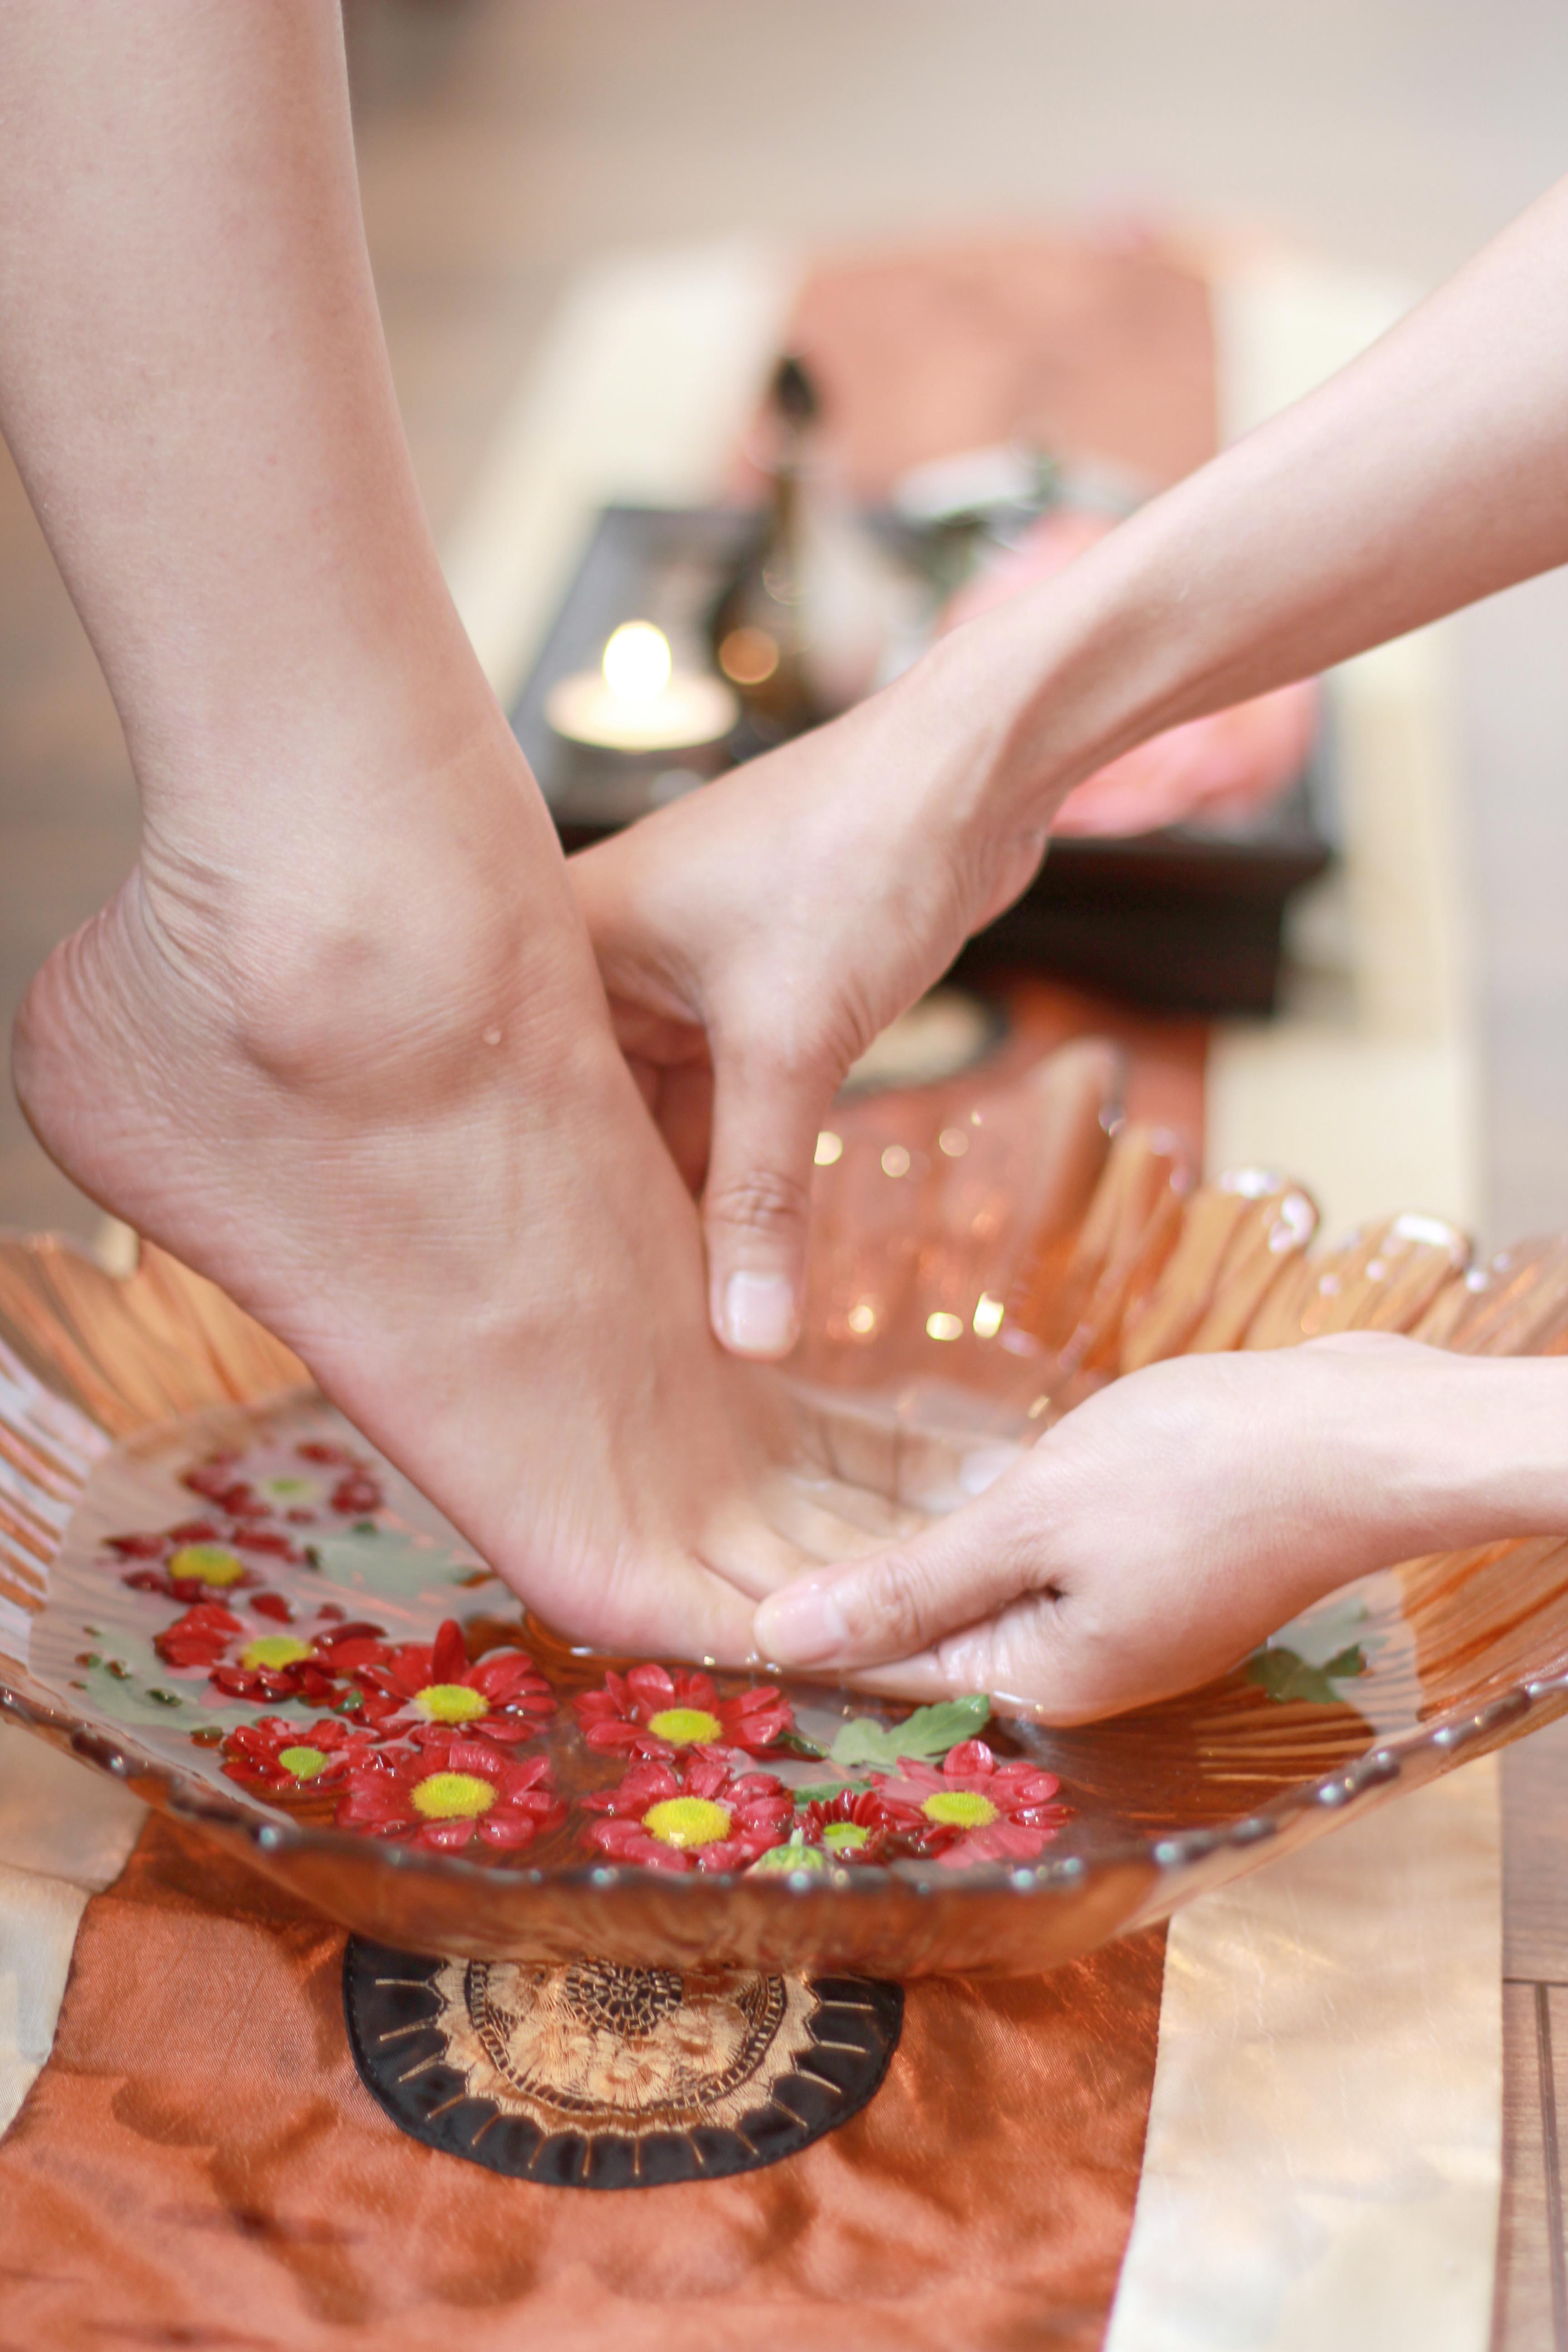 Thai Foot Massage - 30 Min